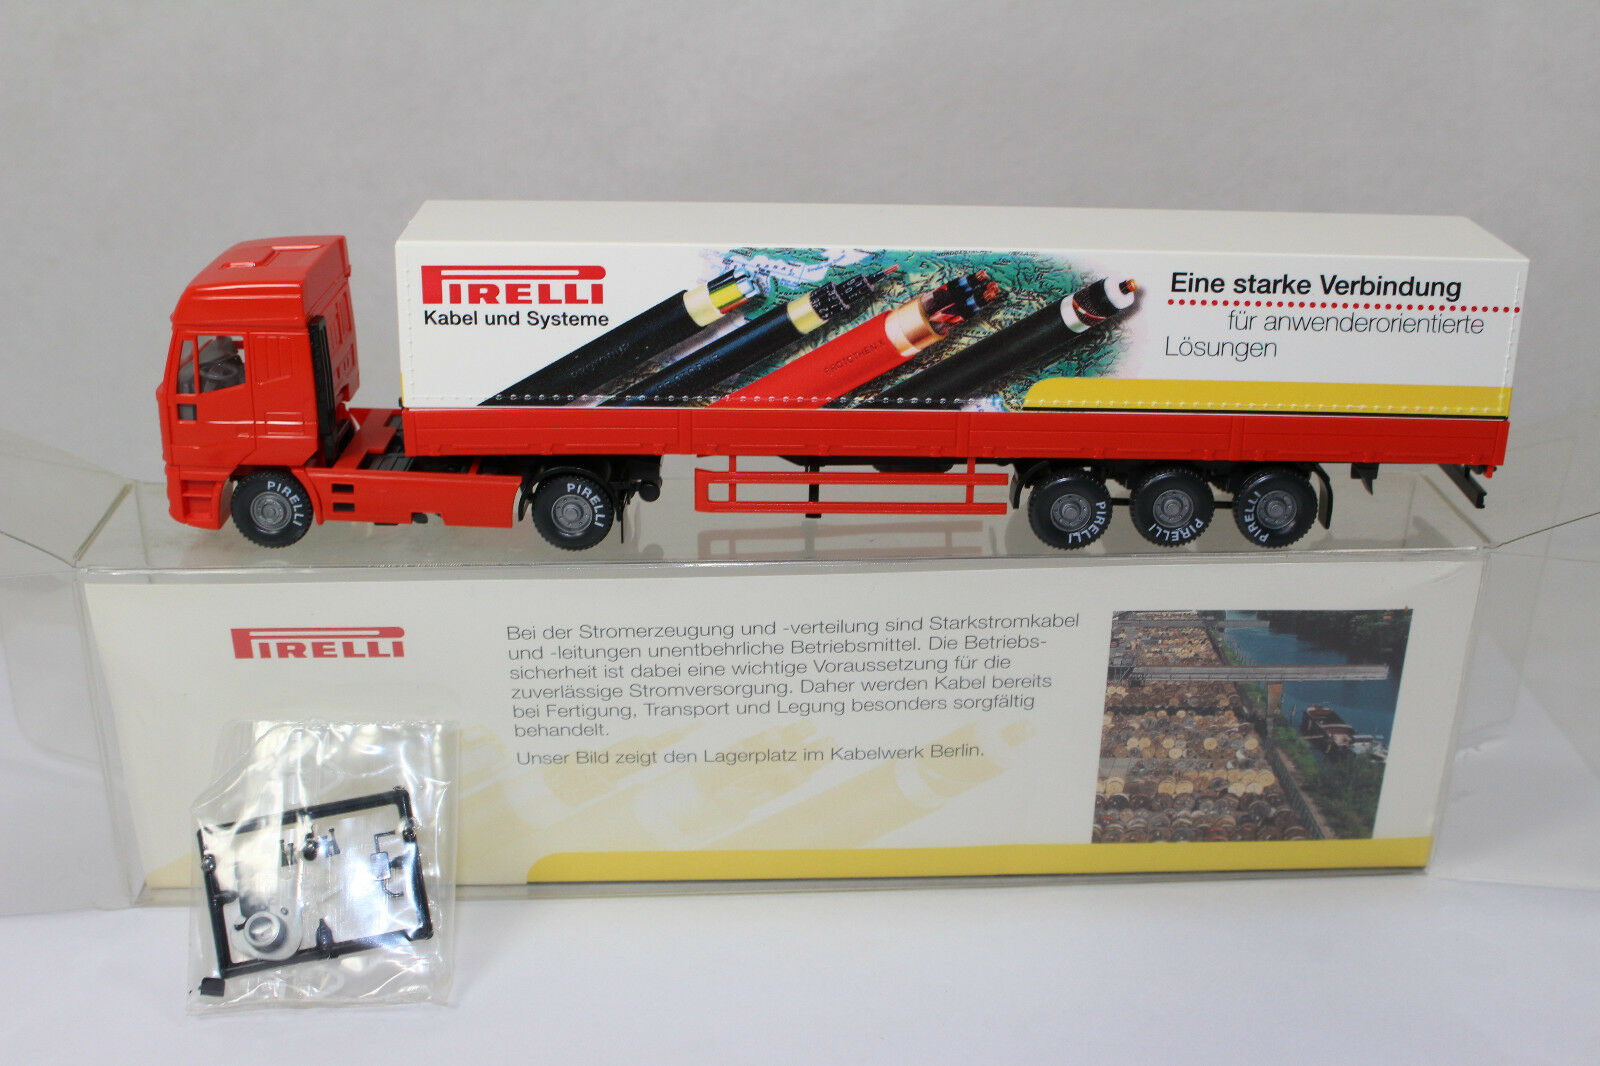 Sw2380, WIKING Siemens IVECO Eurostar Pirelli 1 87 box Comme neuf PUBLICITAIRE modèle 65